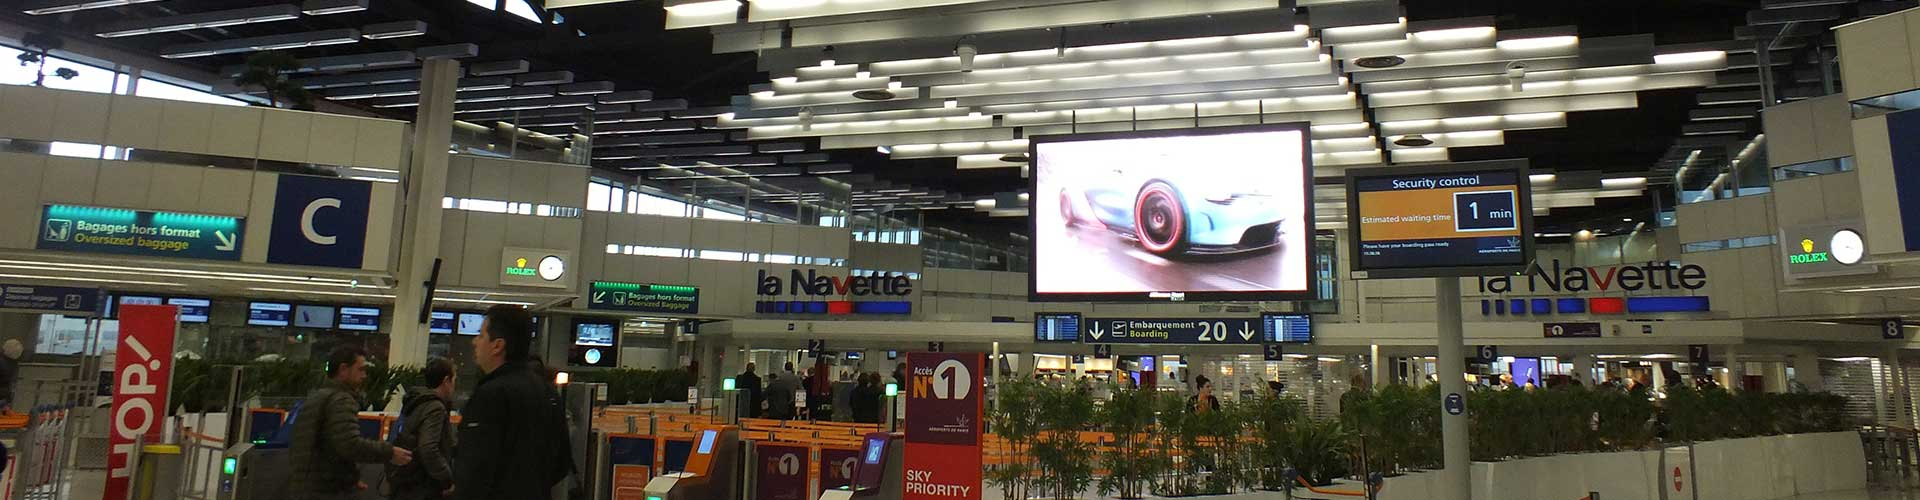 Destratification Fan System Airport Terminal